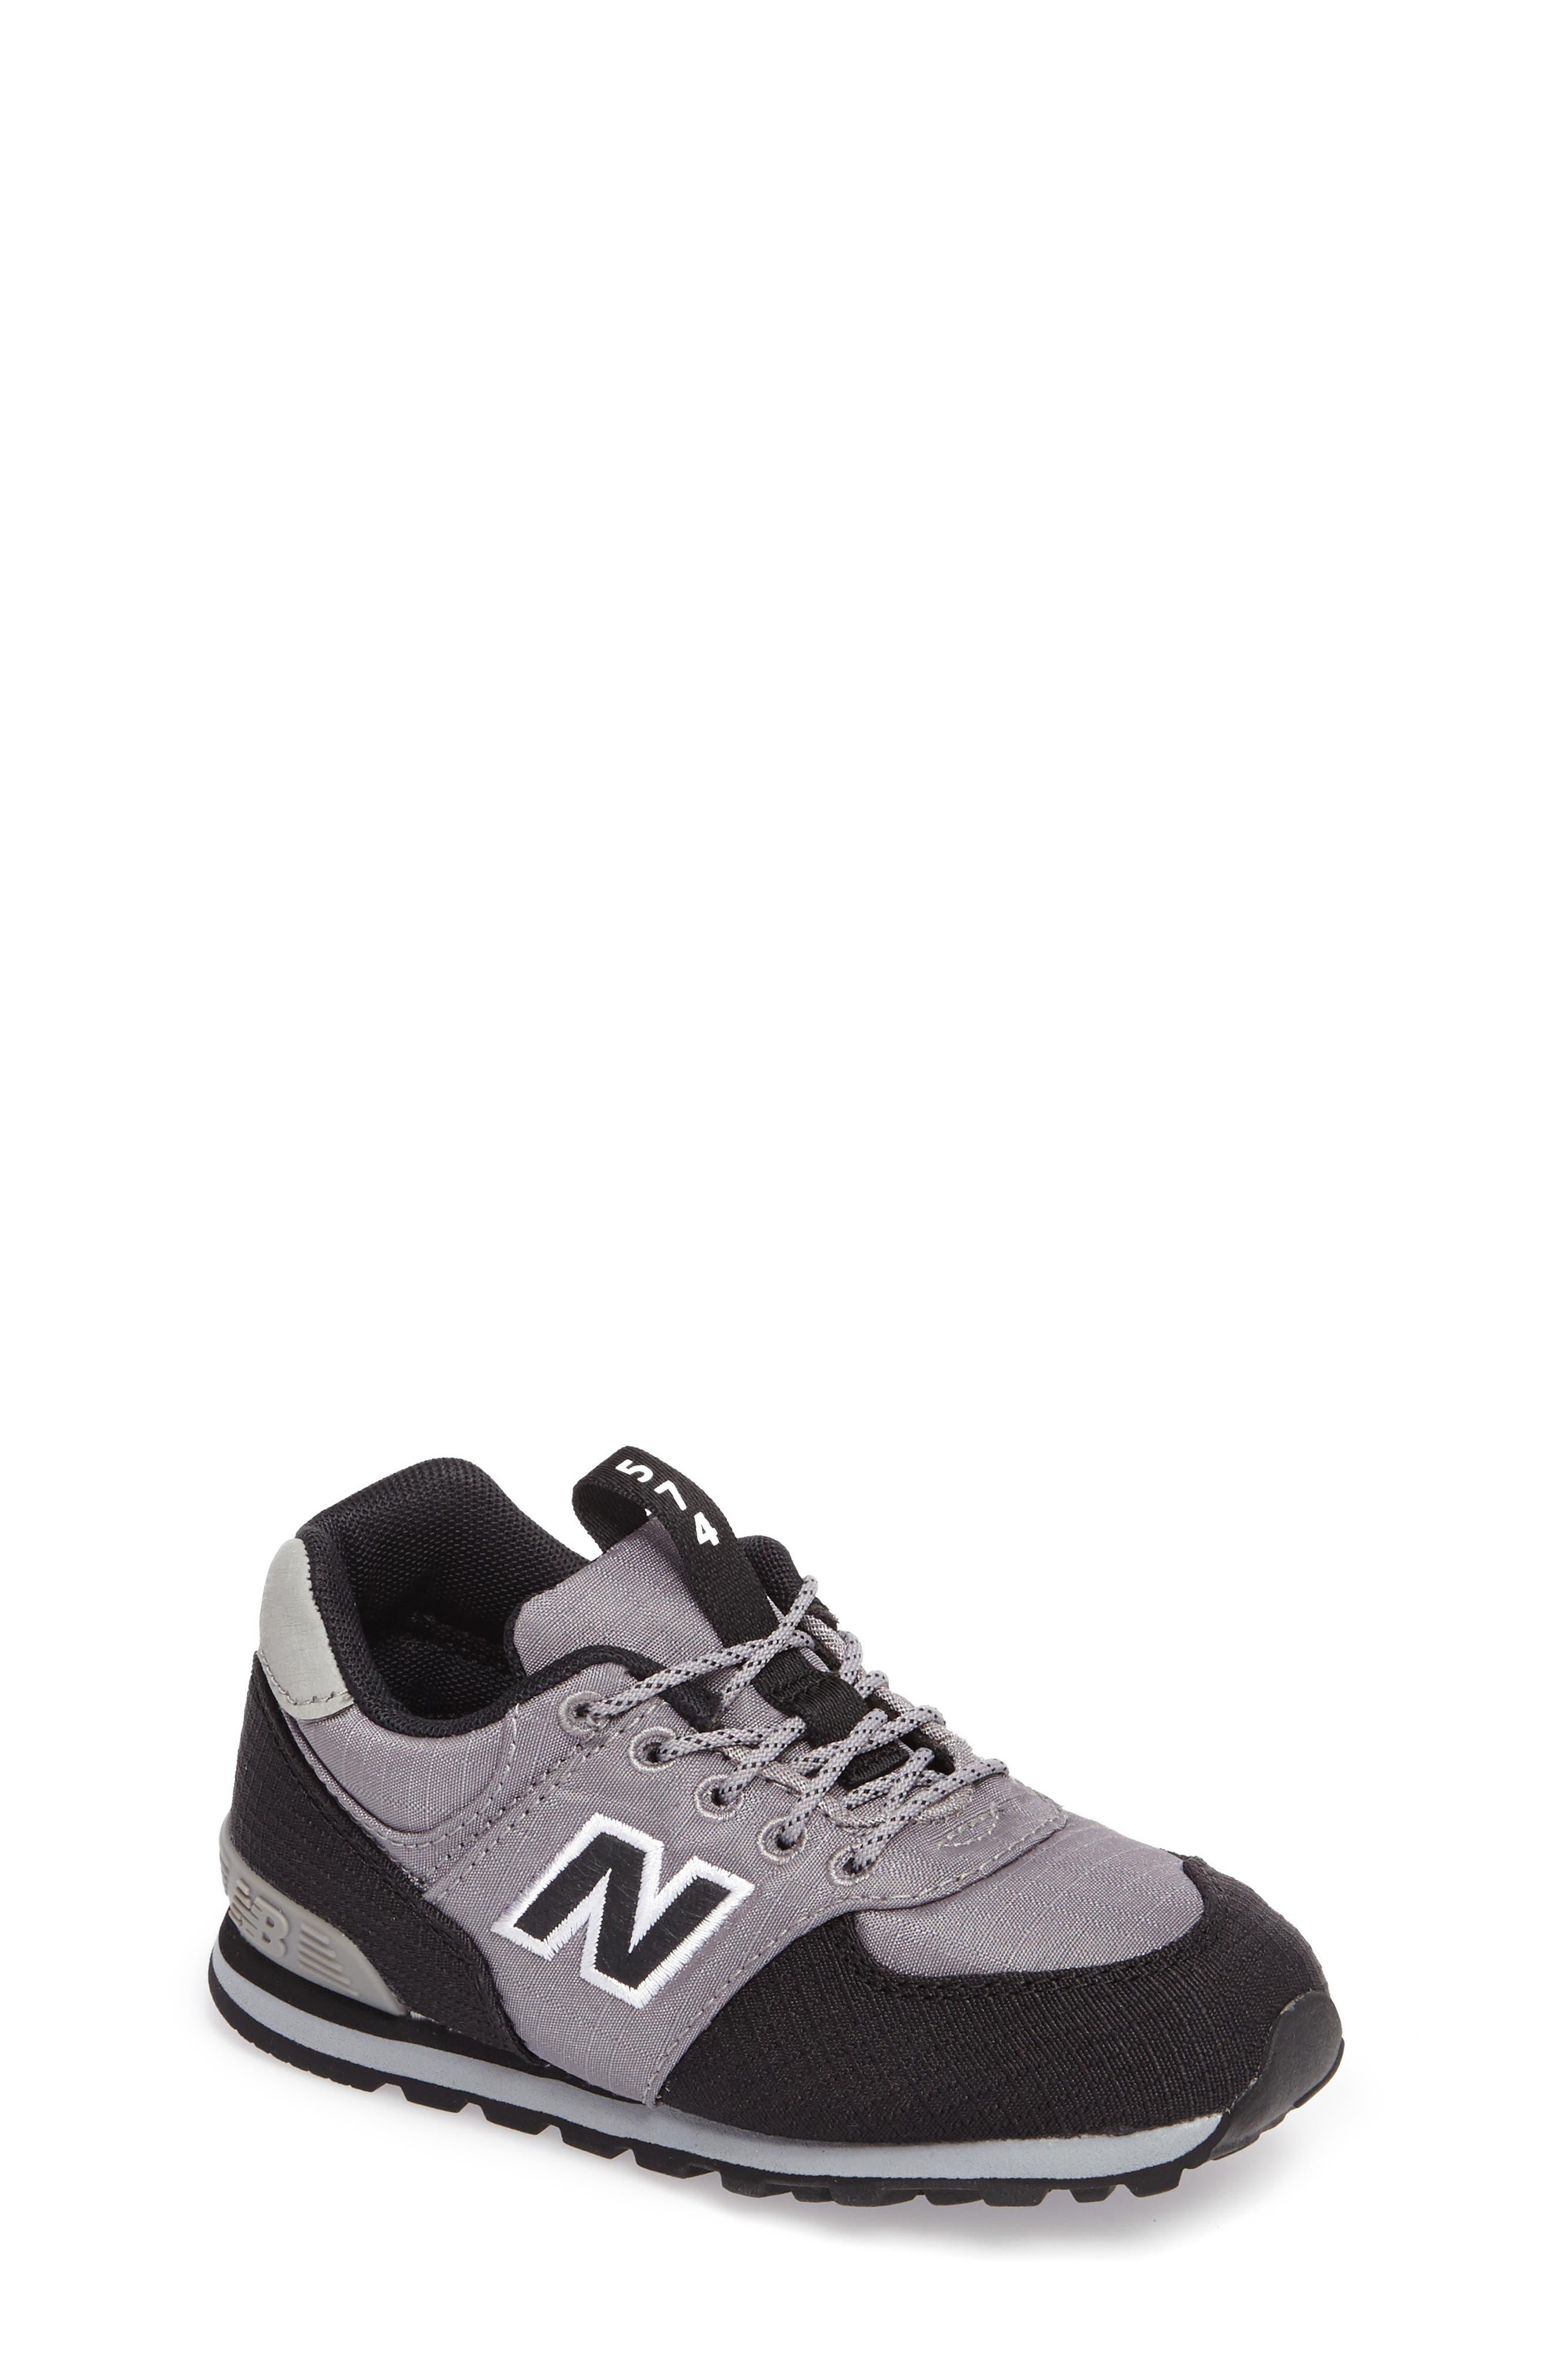 New Balance 990 Sneaker (Baby, Walker & Toddler)